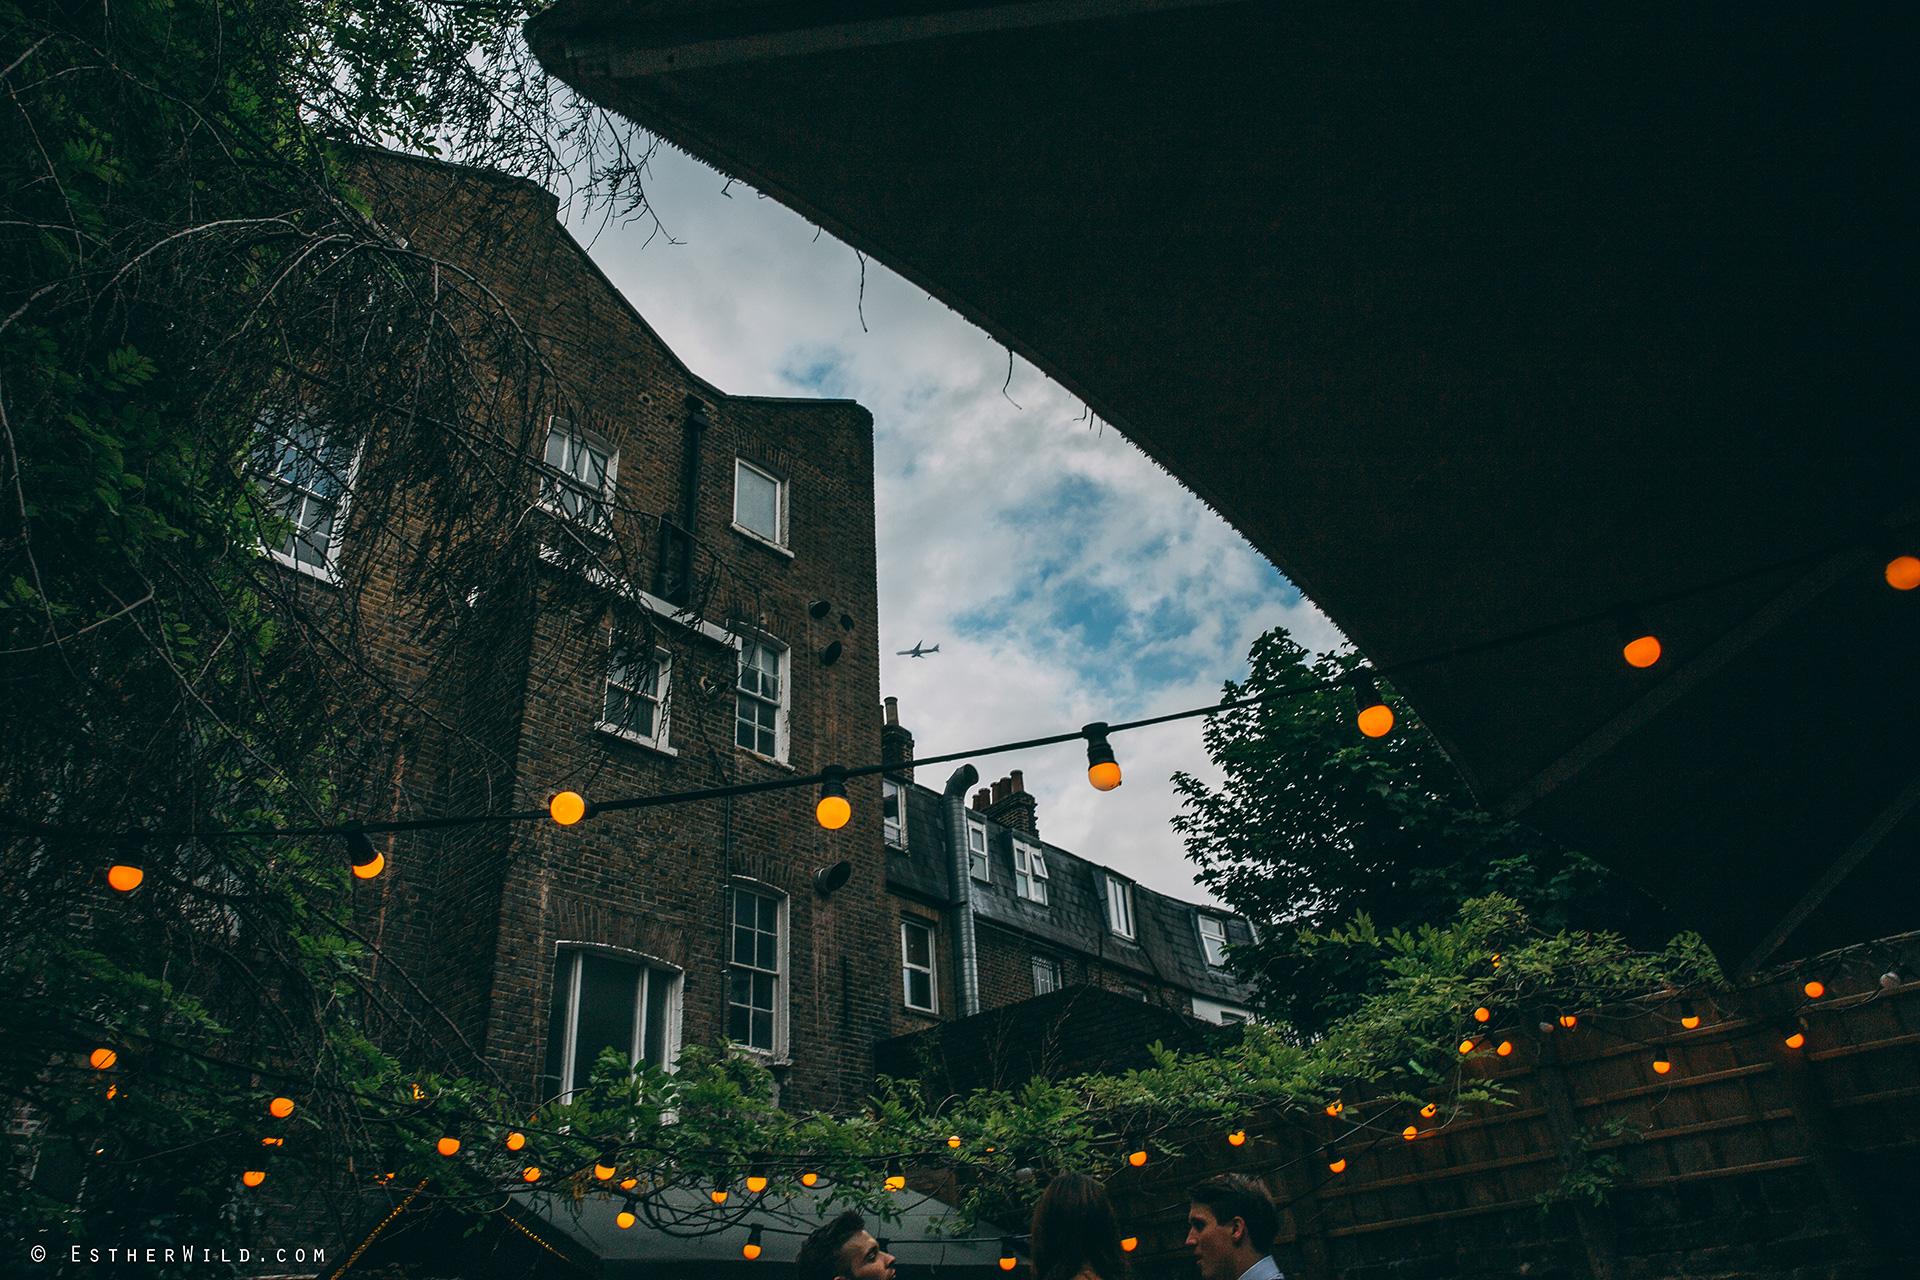 0617_London_Croydon_Clapham_Wedding_Photographer_Esther_Wild_Photography_IMG_6817.jpg